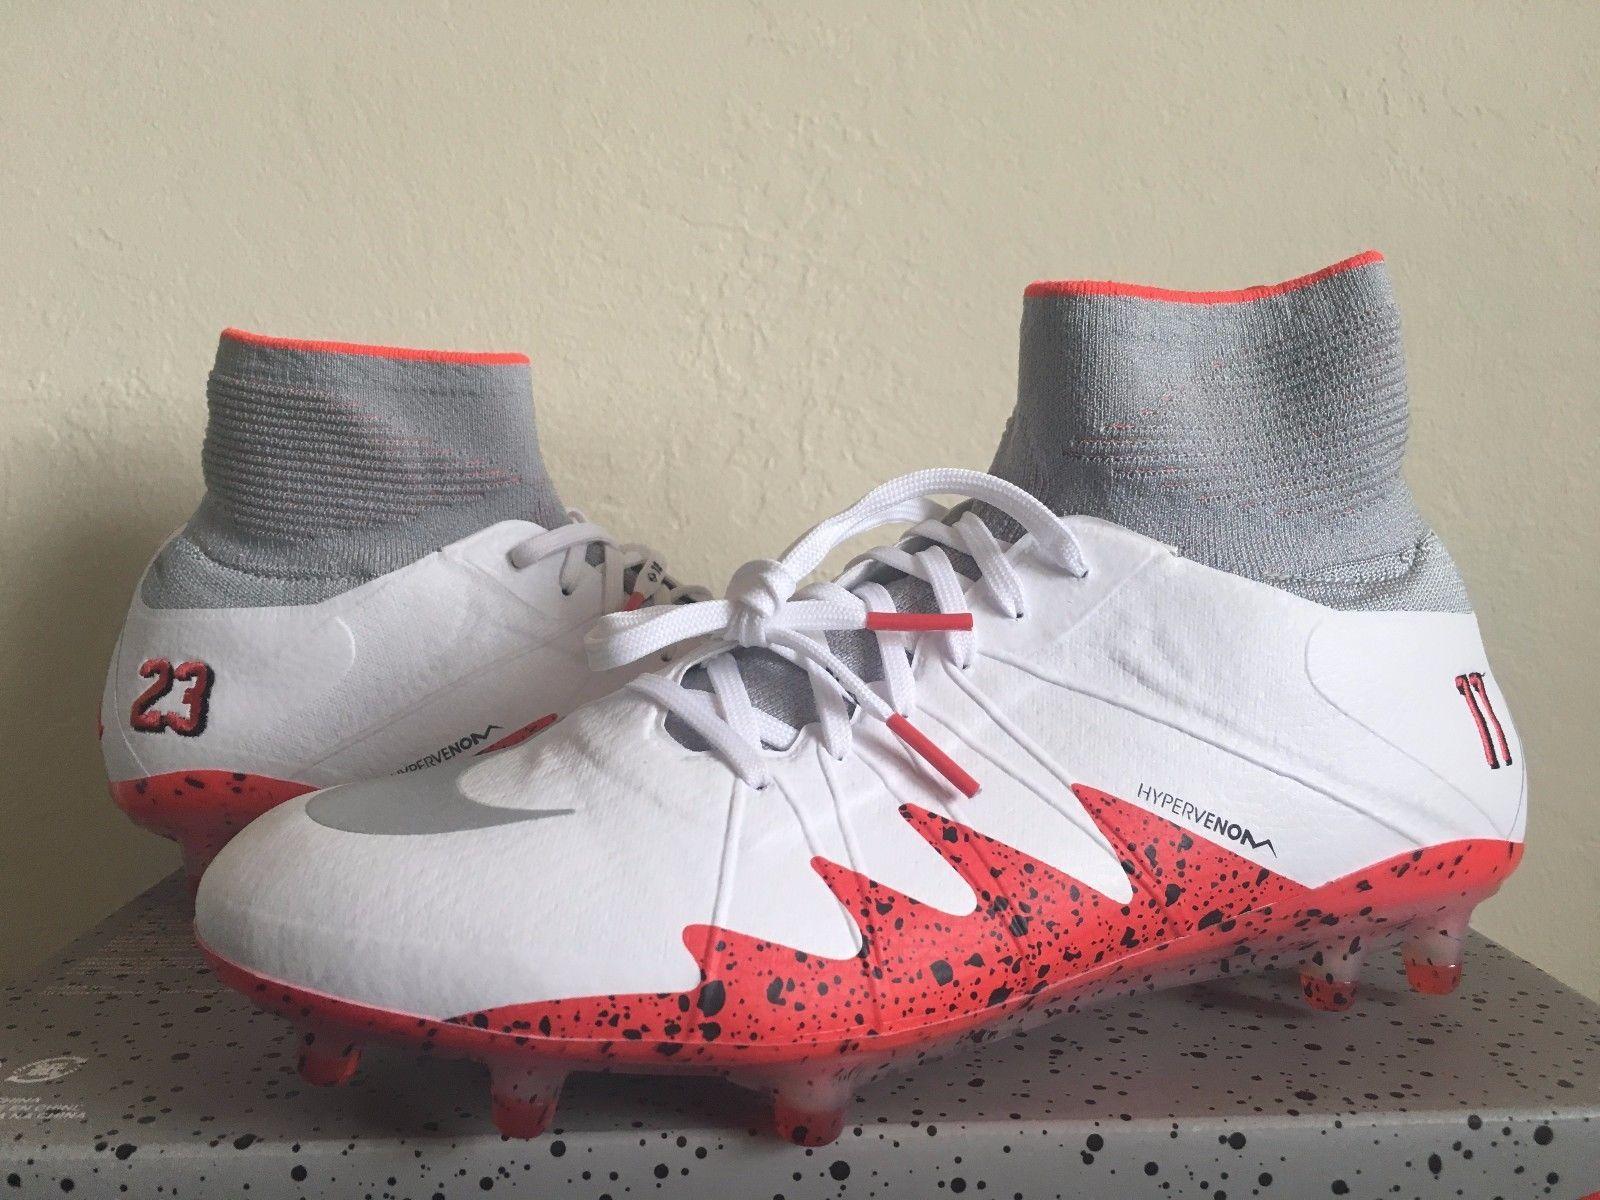 b120e204528 jordan soccer shoes on sale   OFF67% Discounts